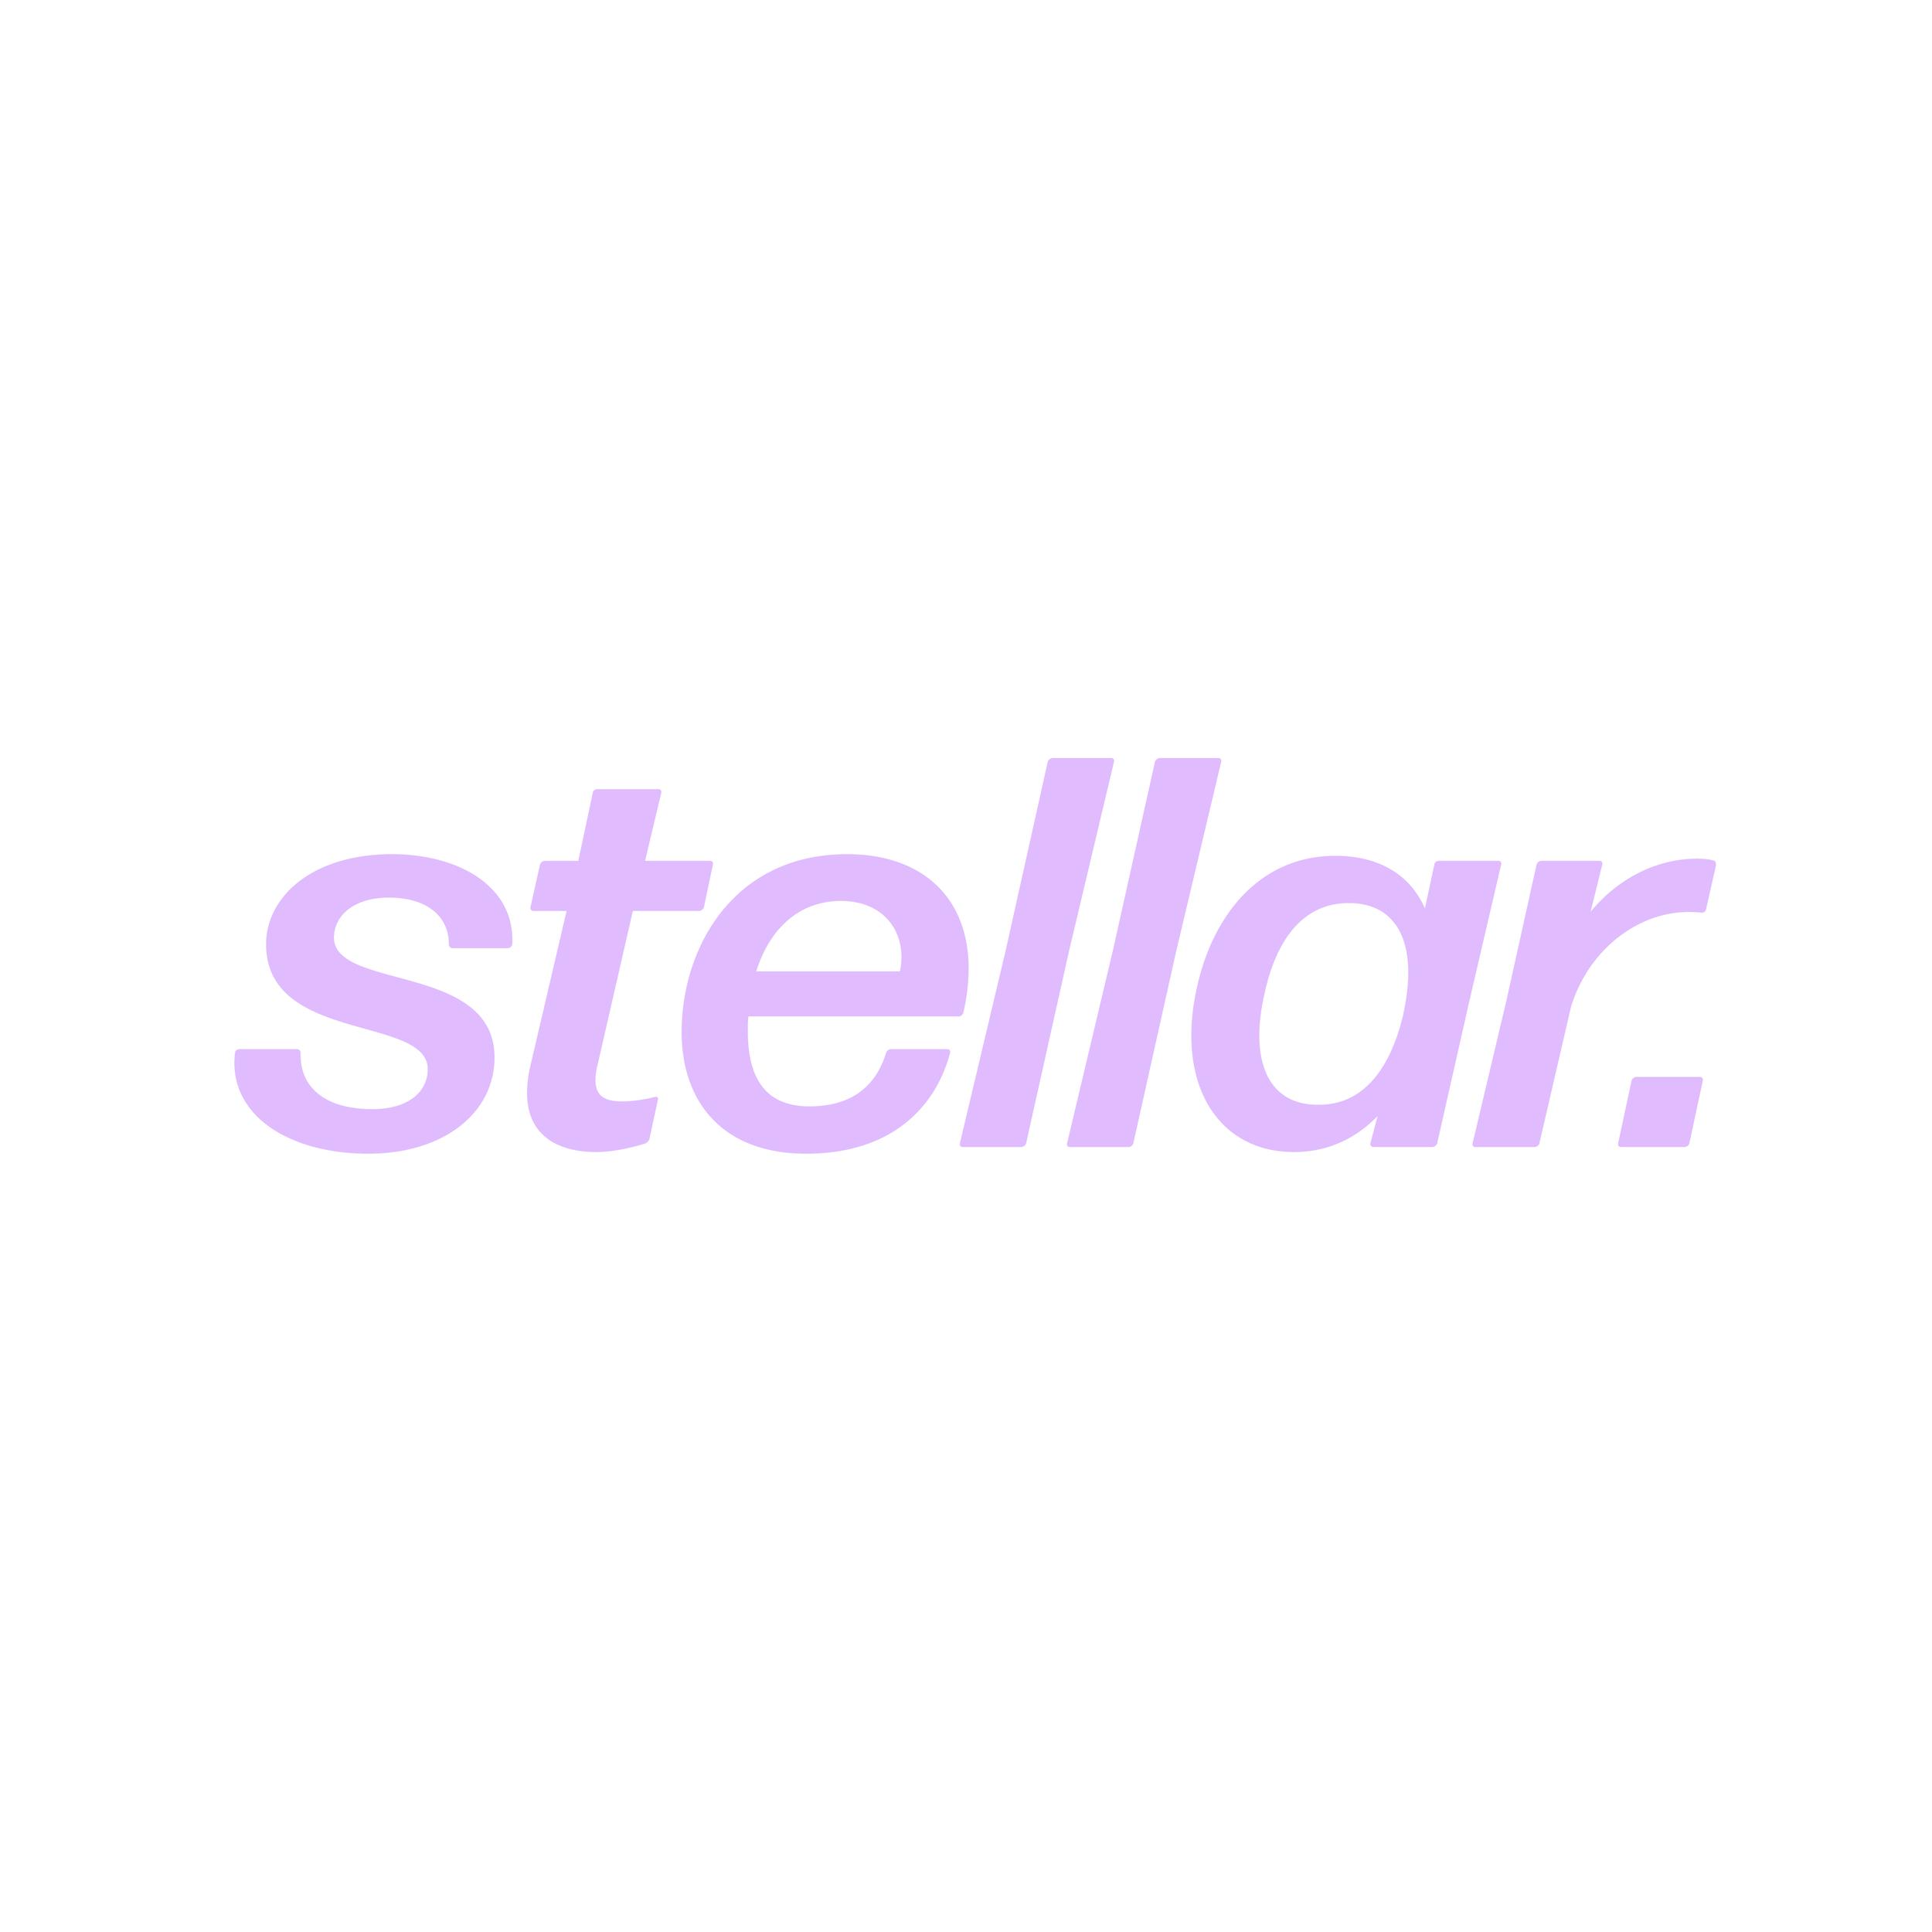 stellar_show-15.png